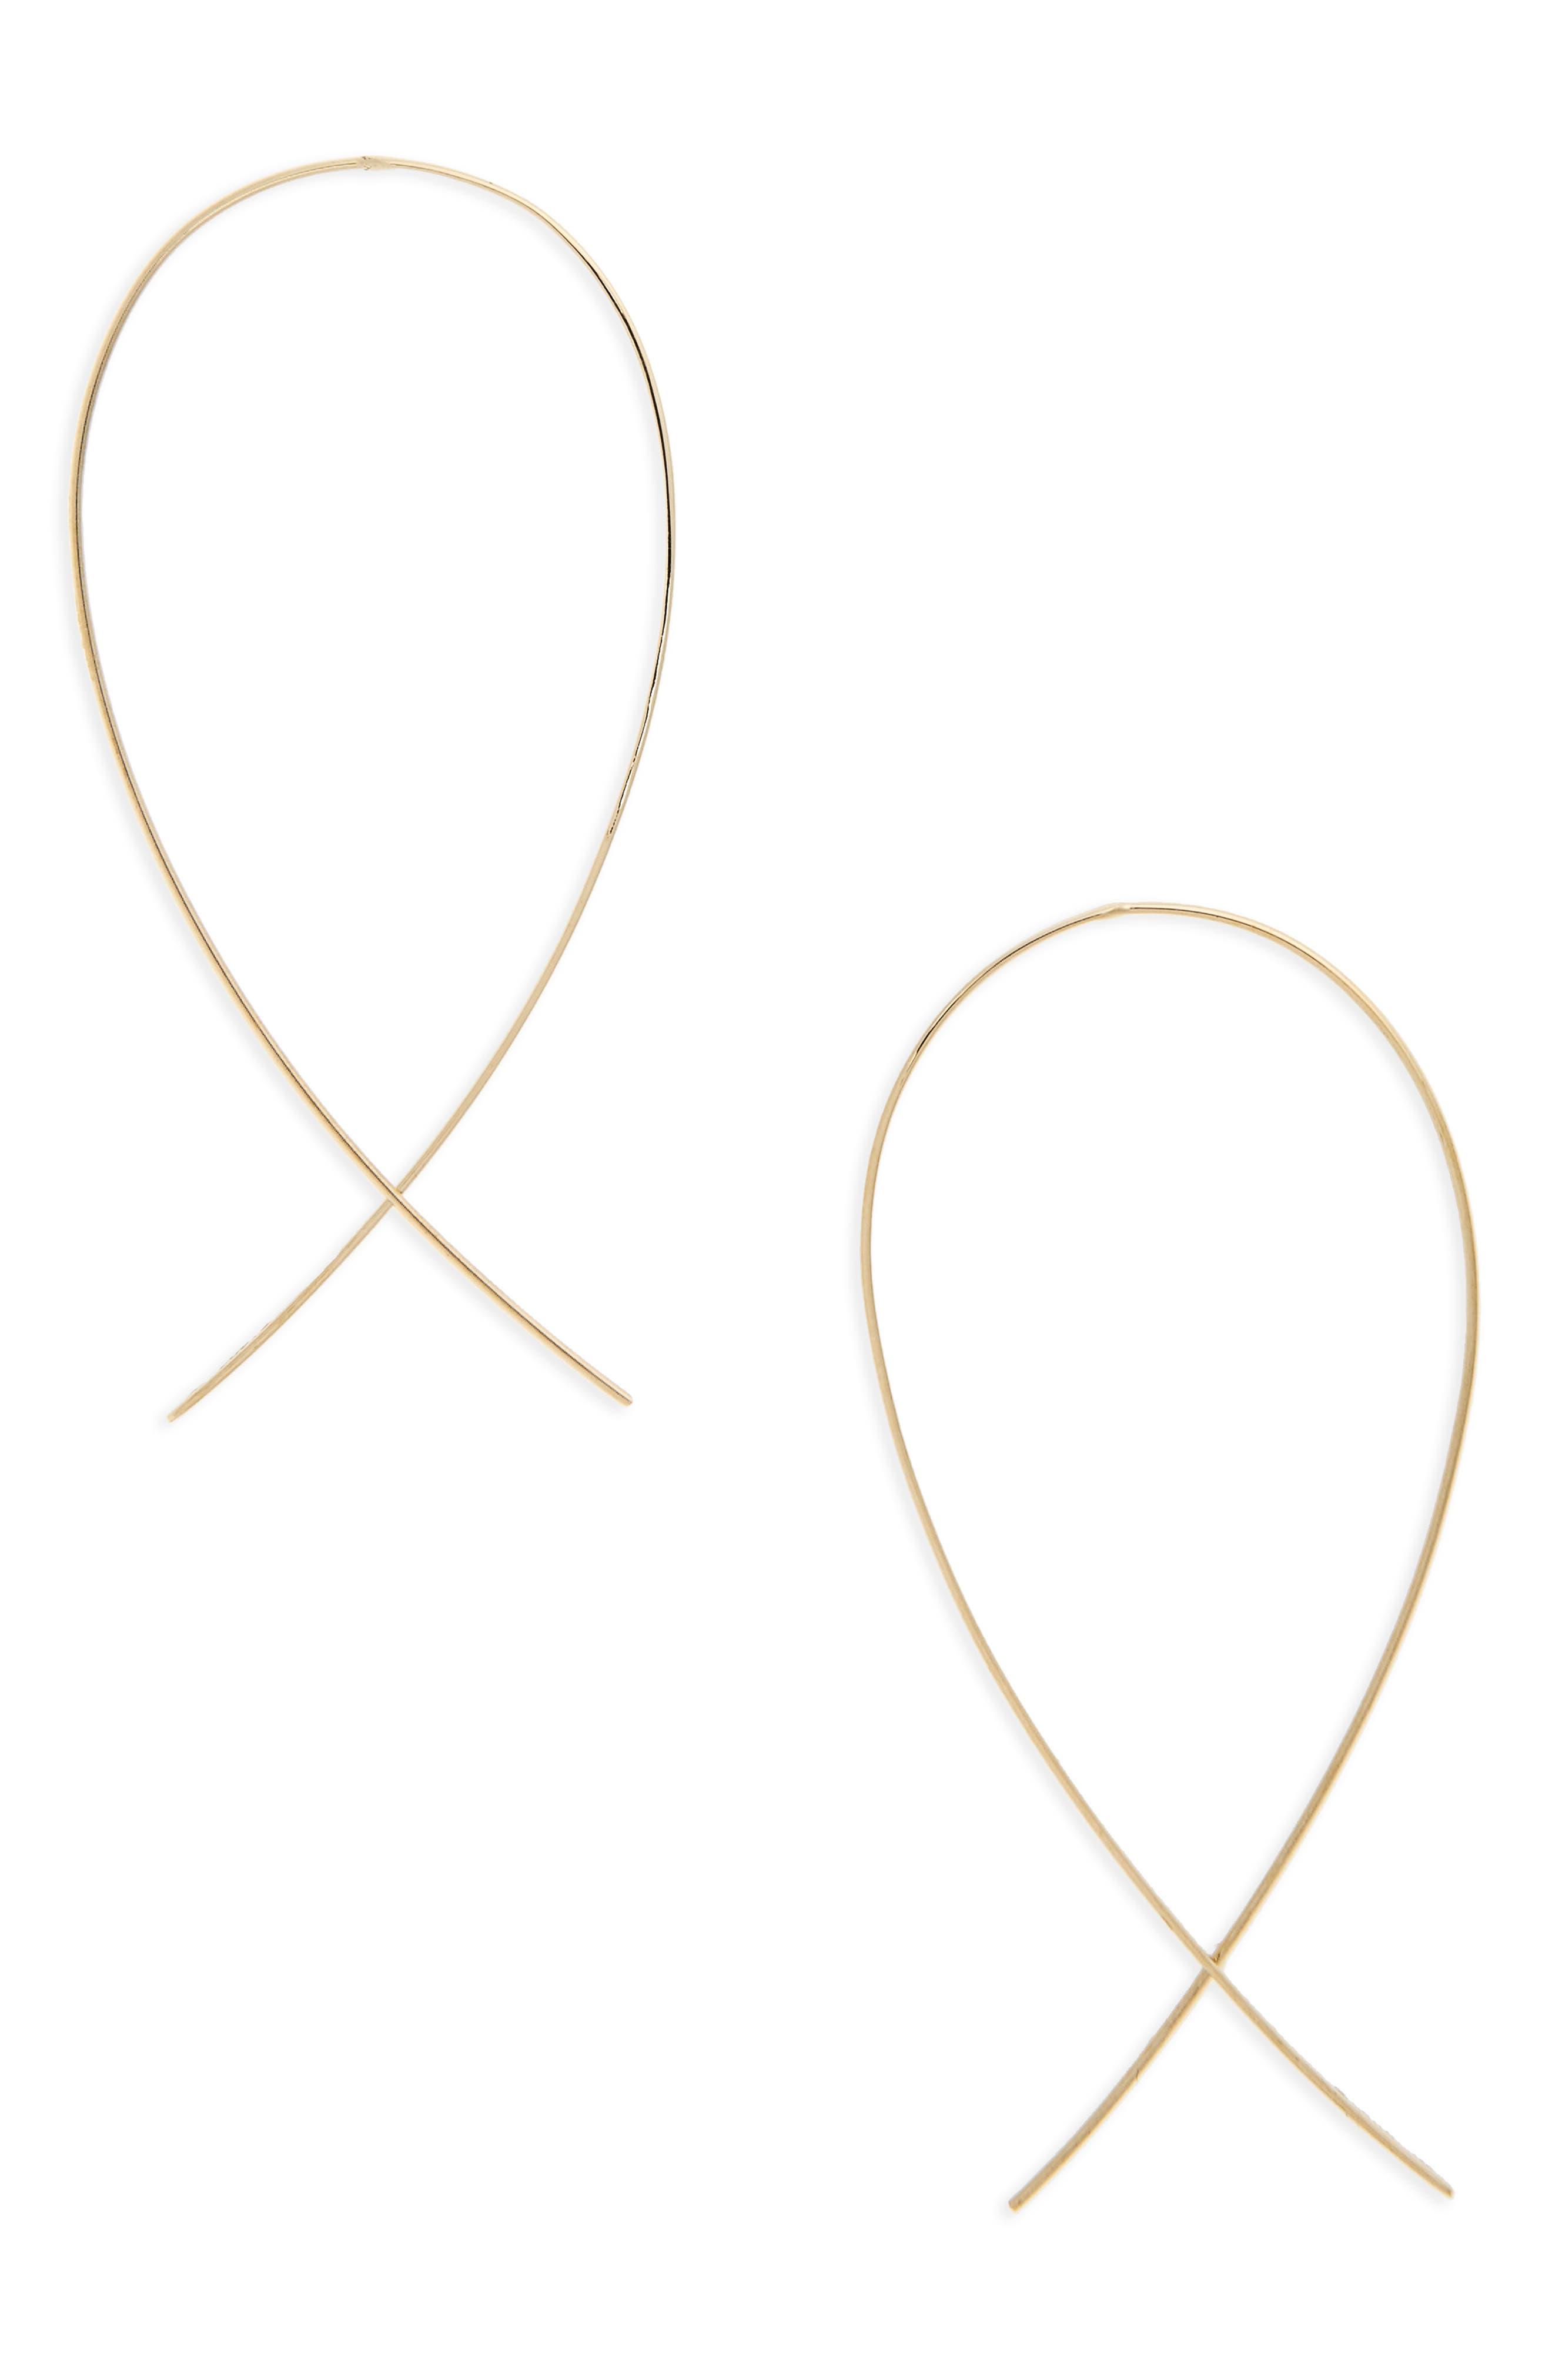 Medium Upside Down Hoop Earrings,                         Main,                         color, YELLOW GOLD